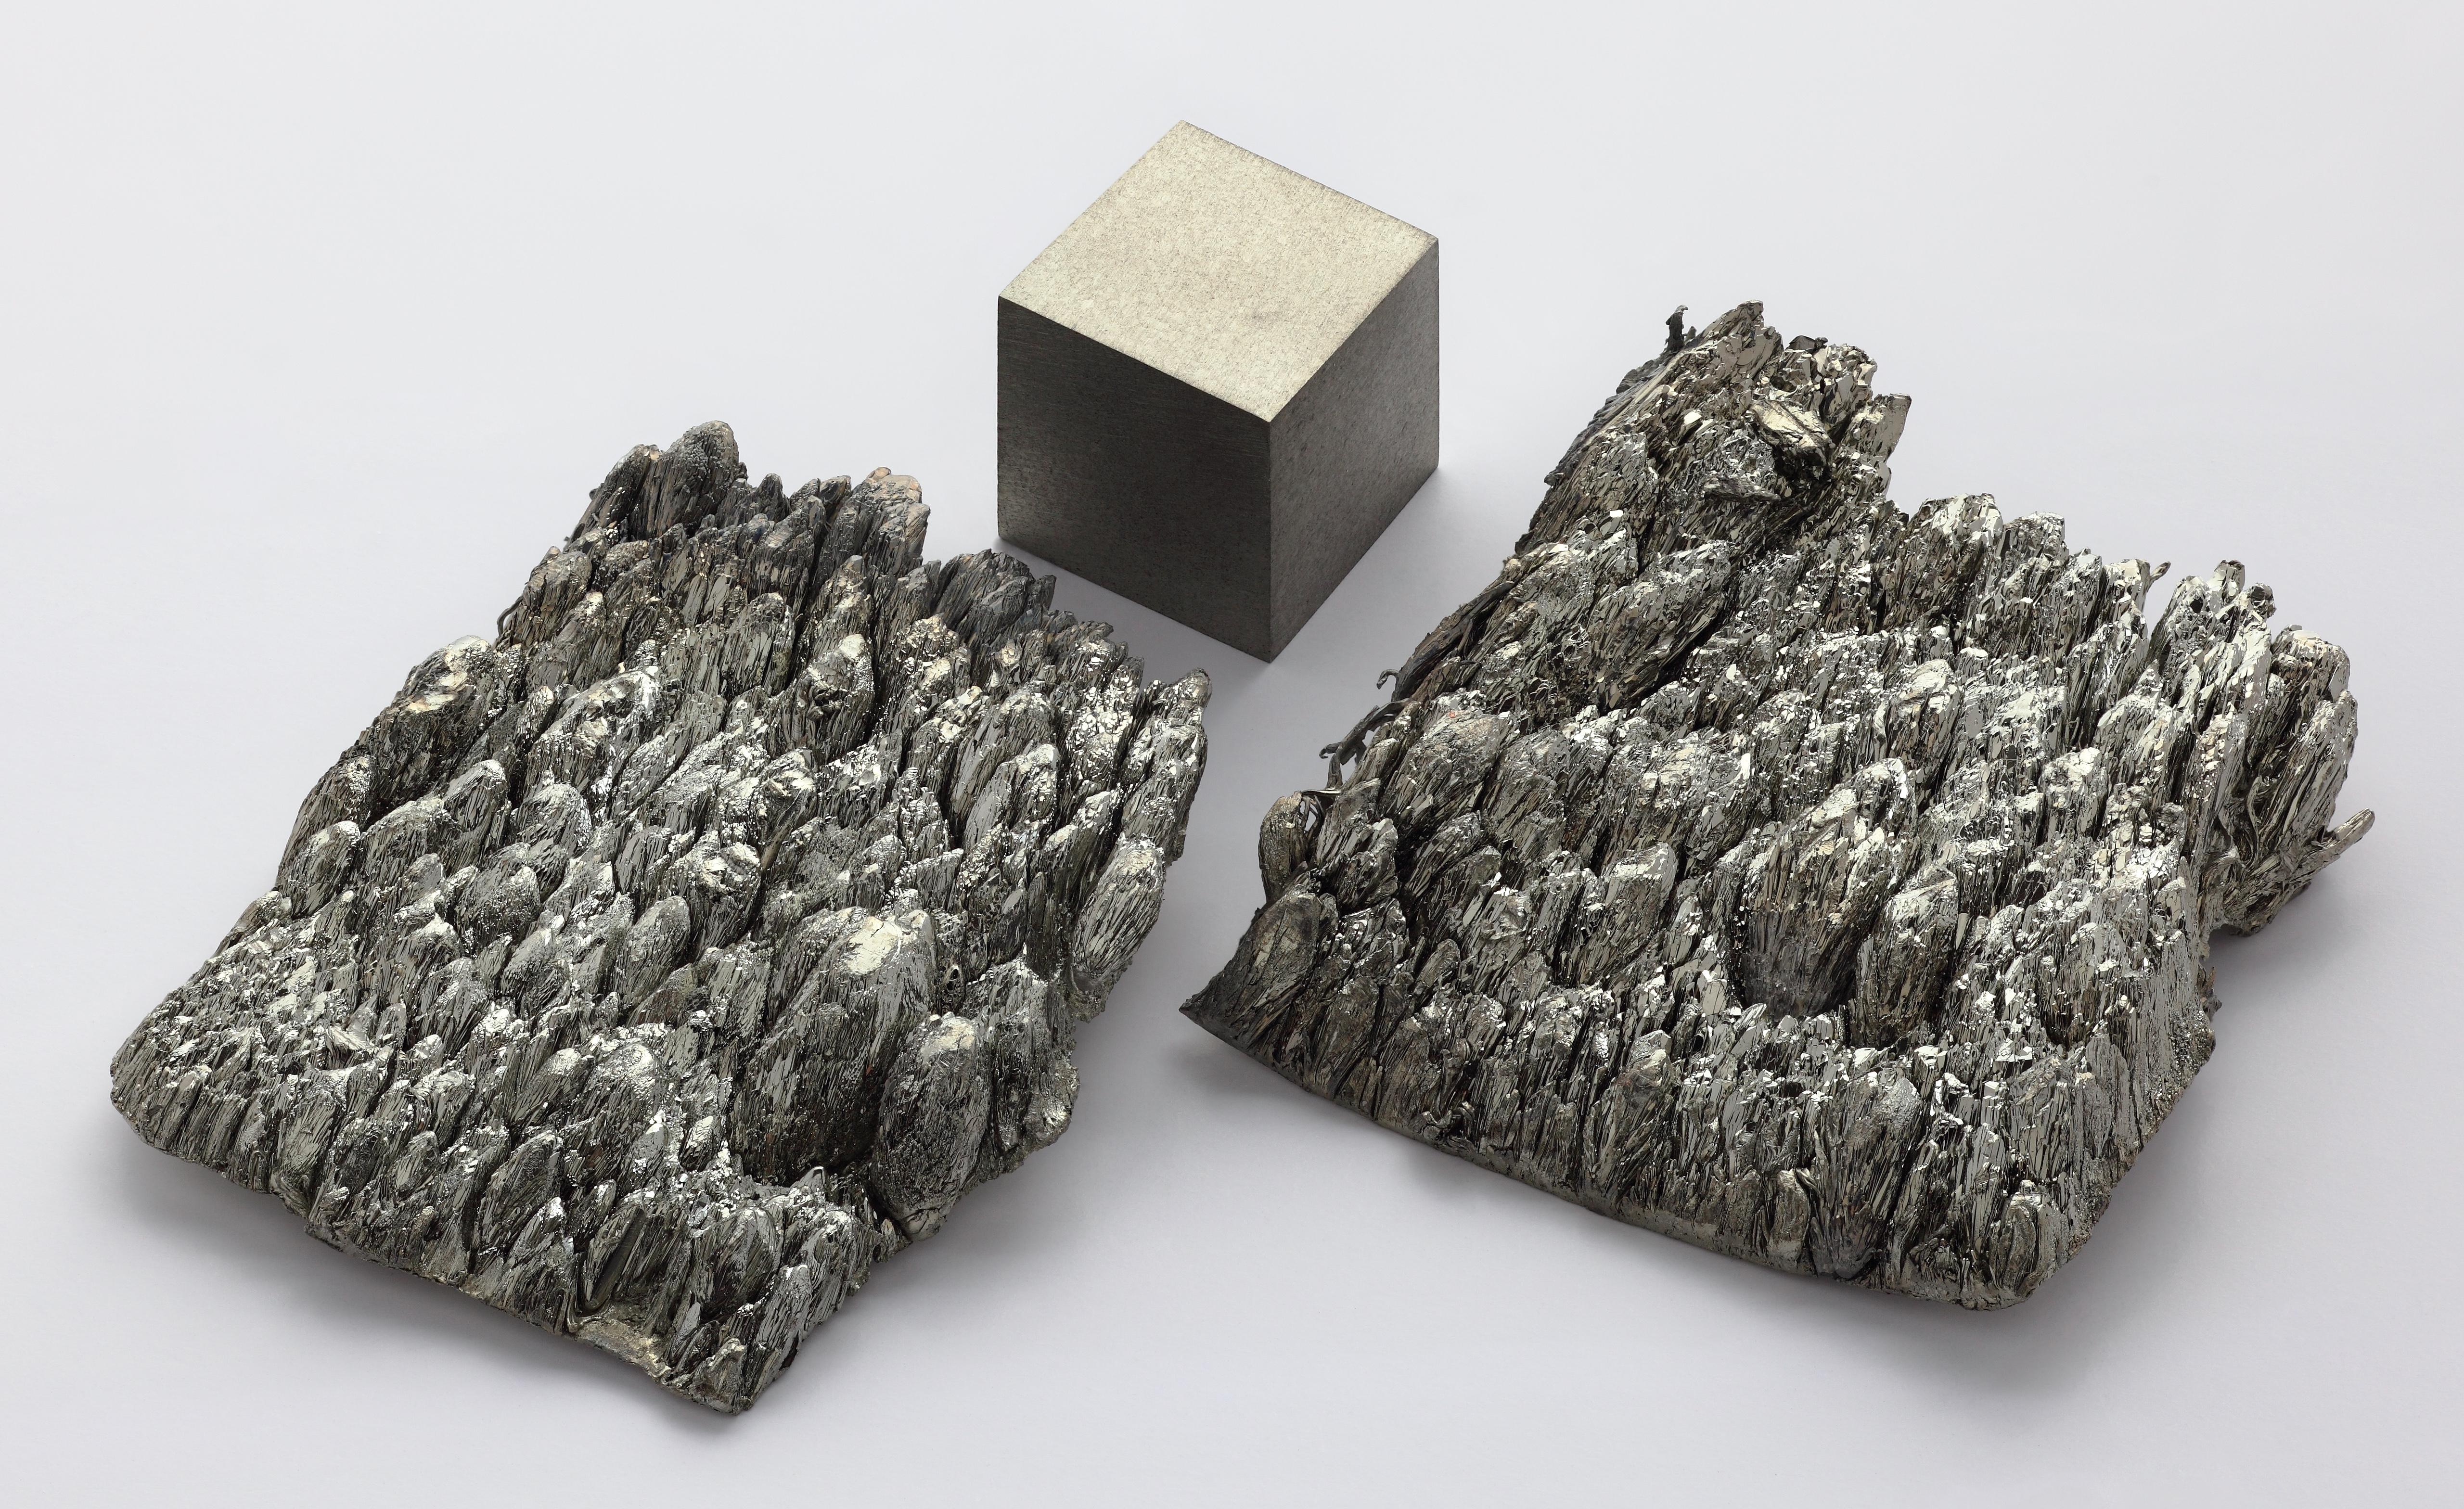 Pure Scandium Cube and Dendrite Crystals (photo credit: Alchemist-hp)